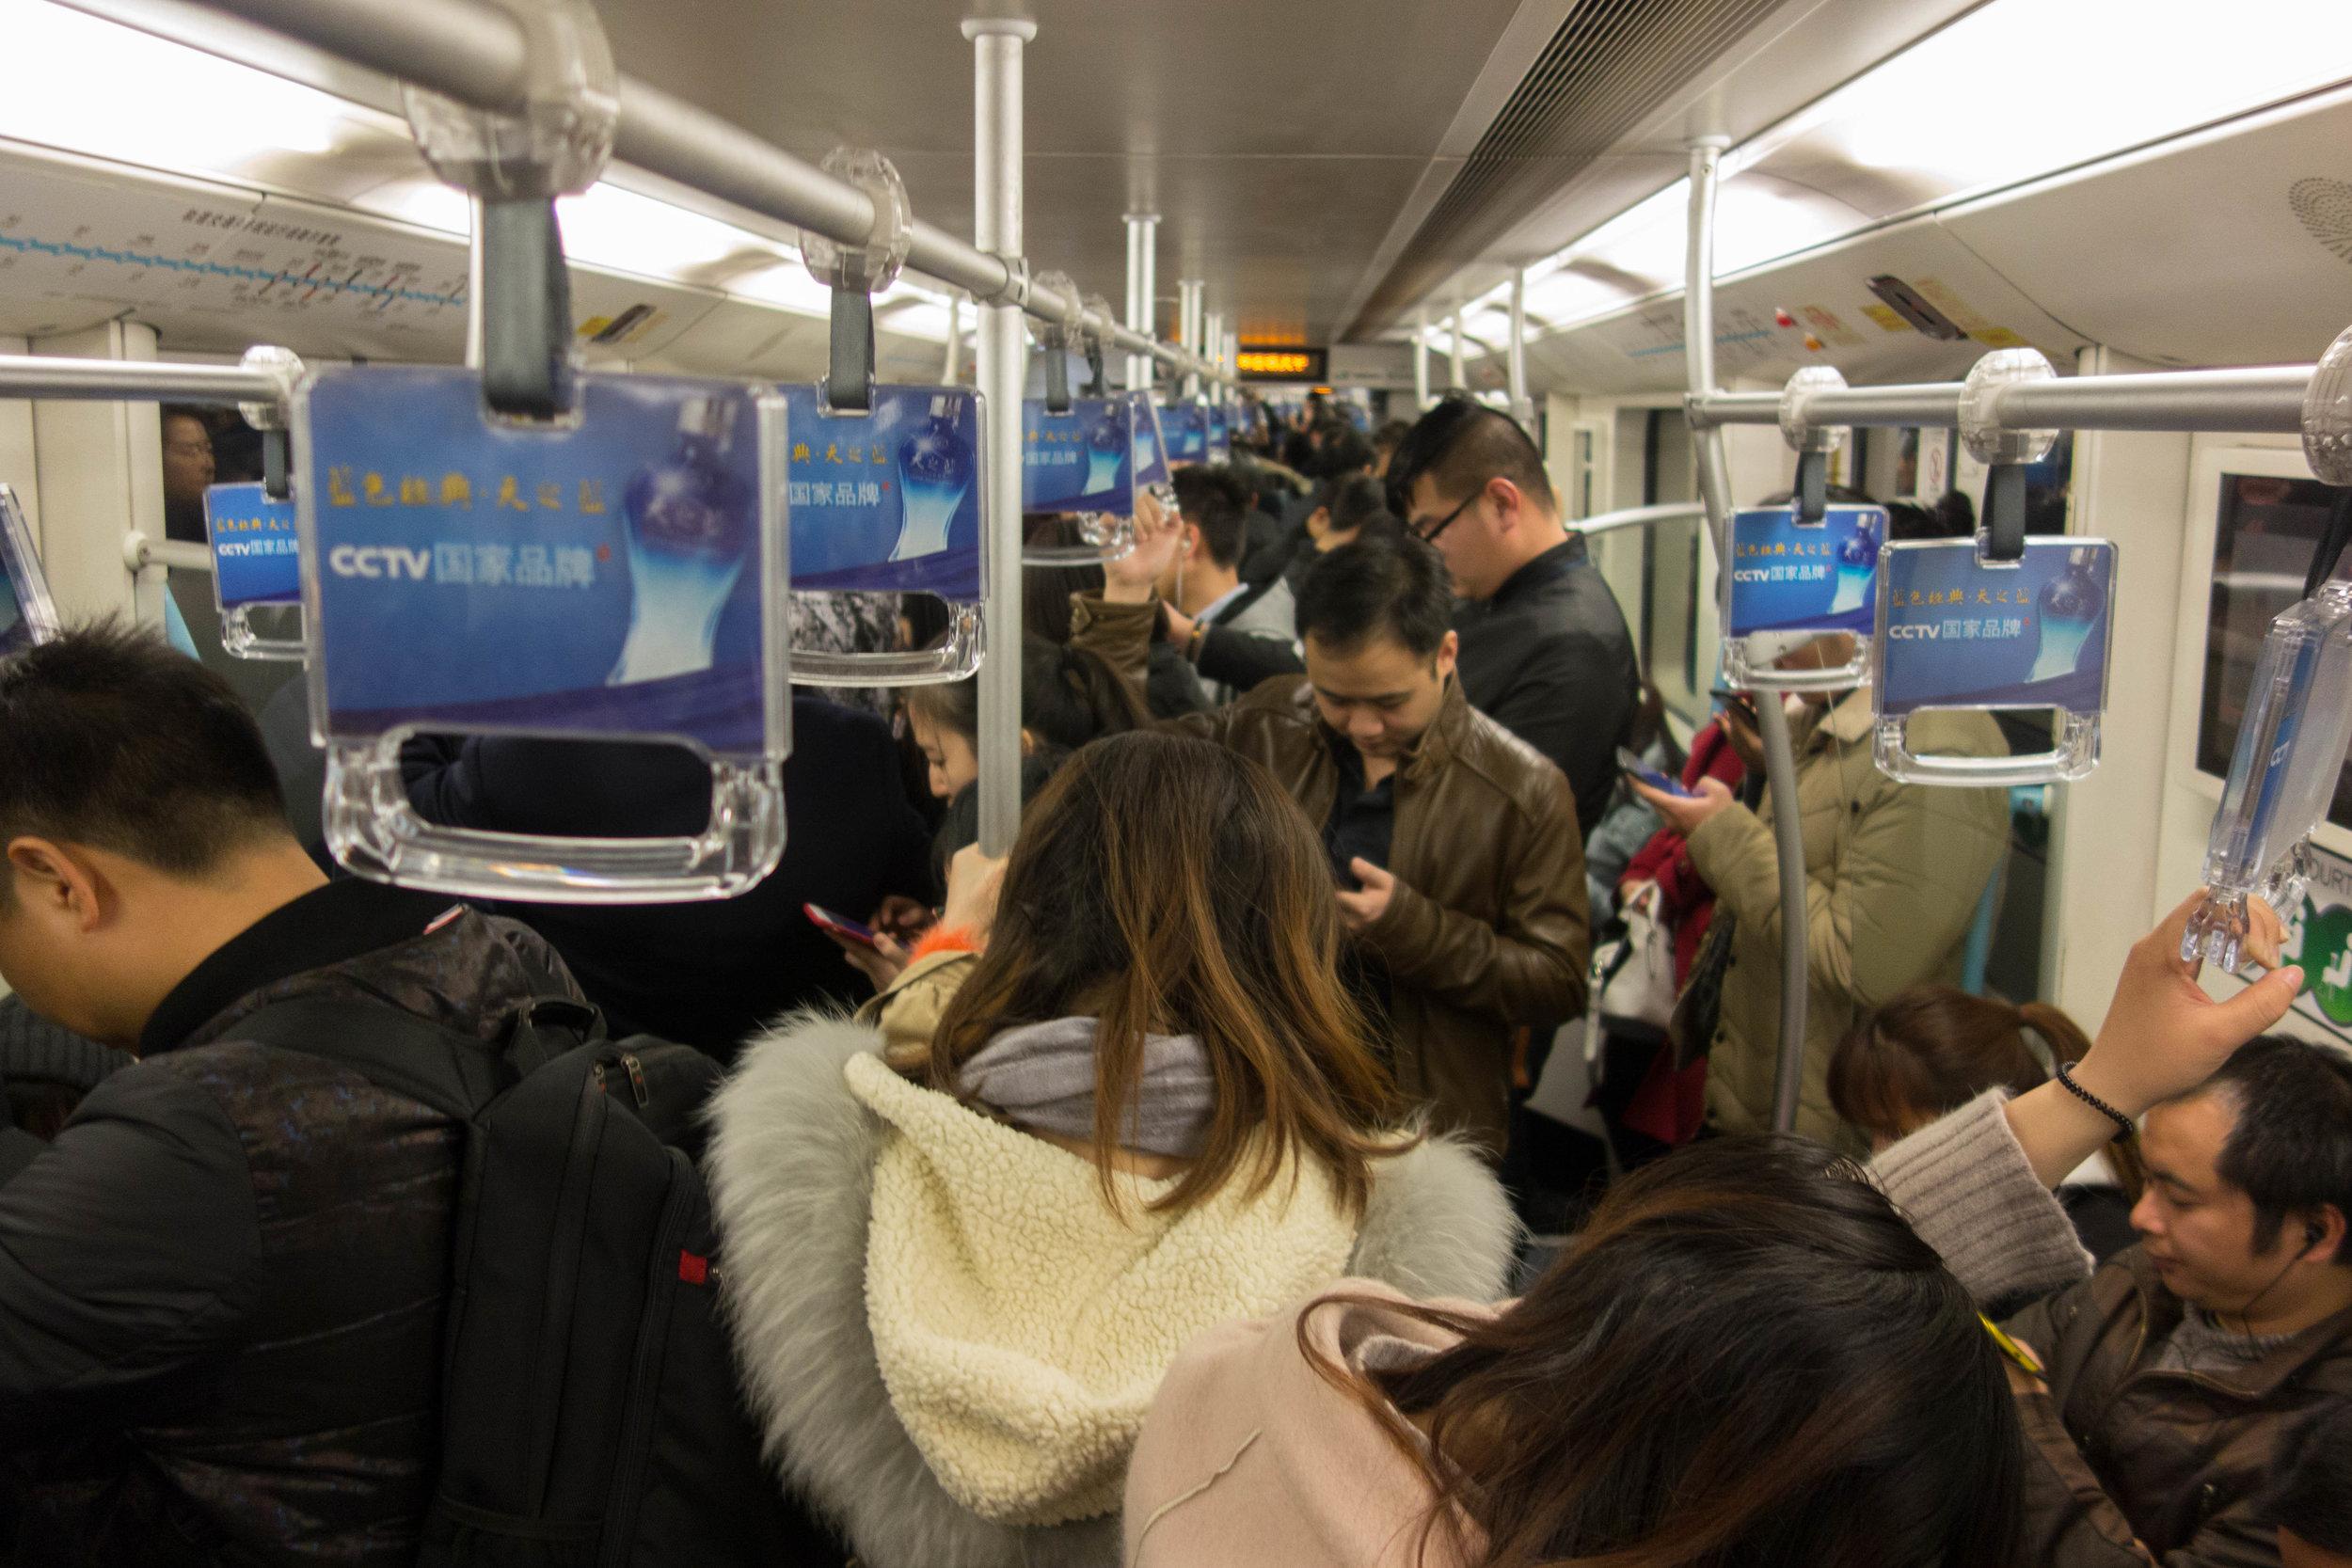 Typical subway scene